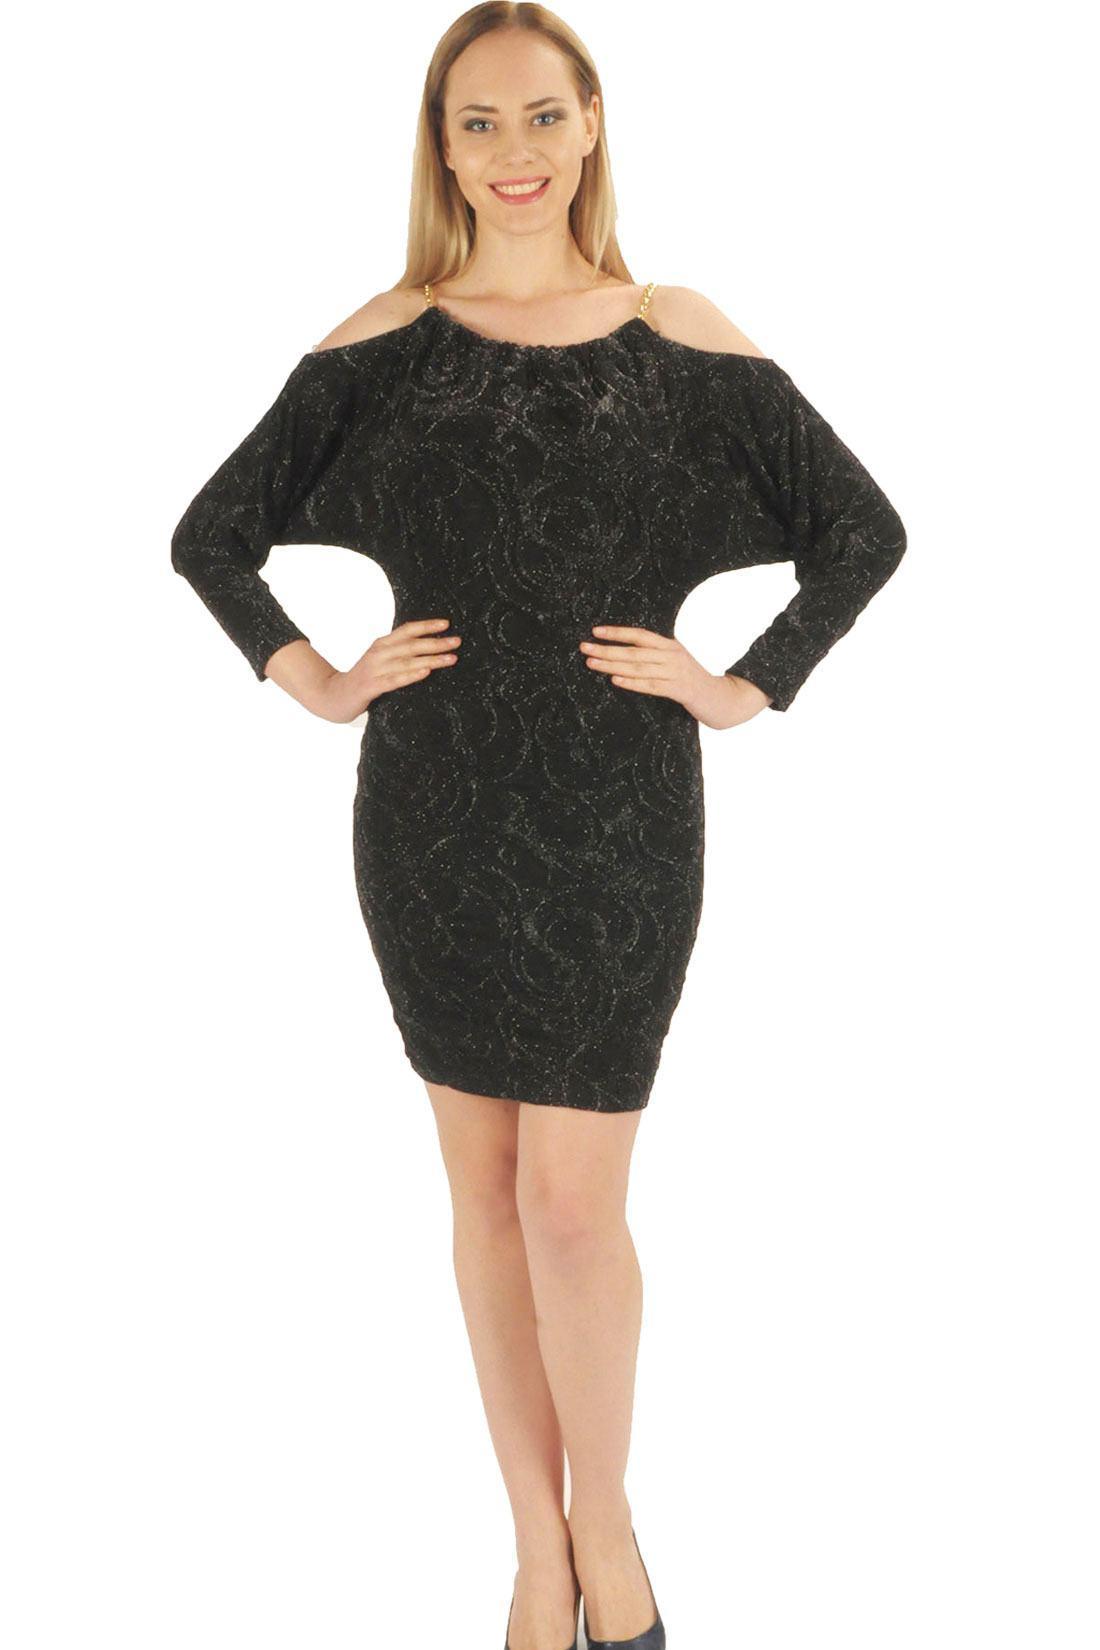 16279e84a901b Siyah Omuz Zincir Detaylı Bayan Elbise